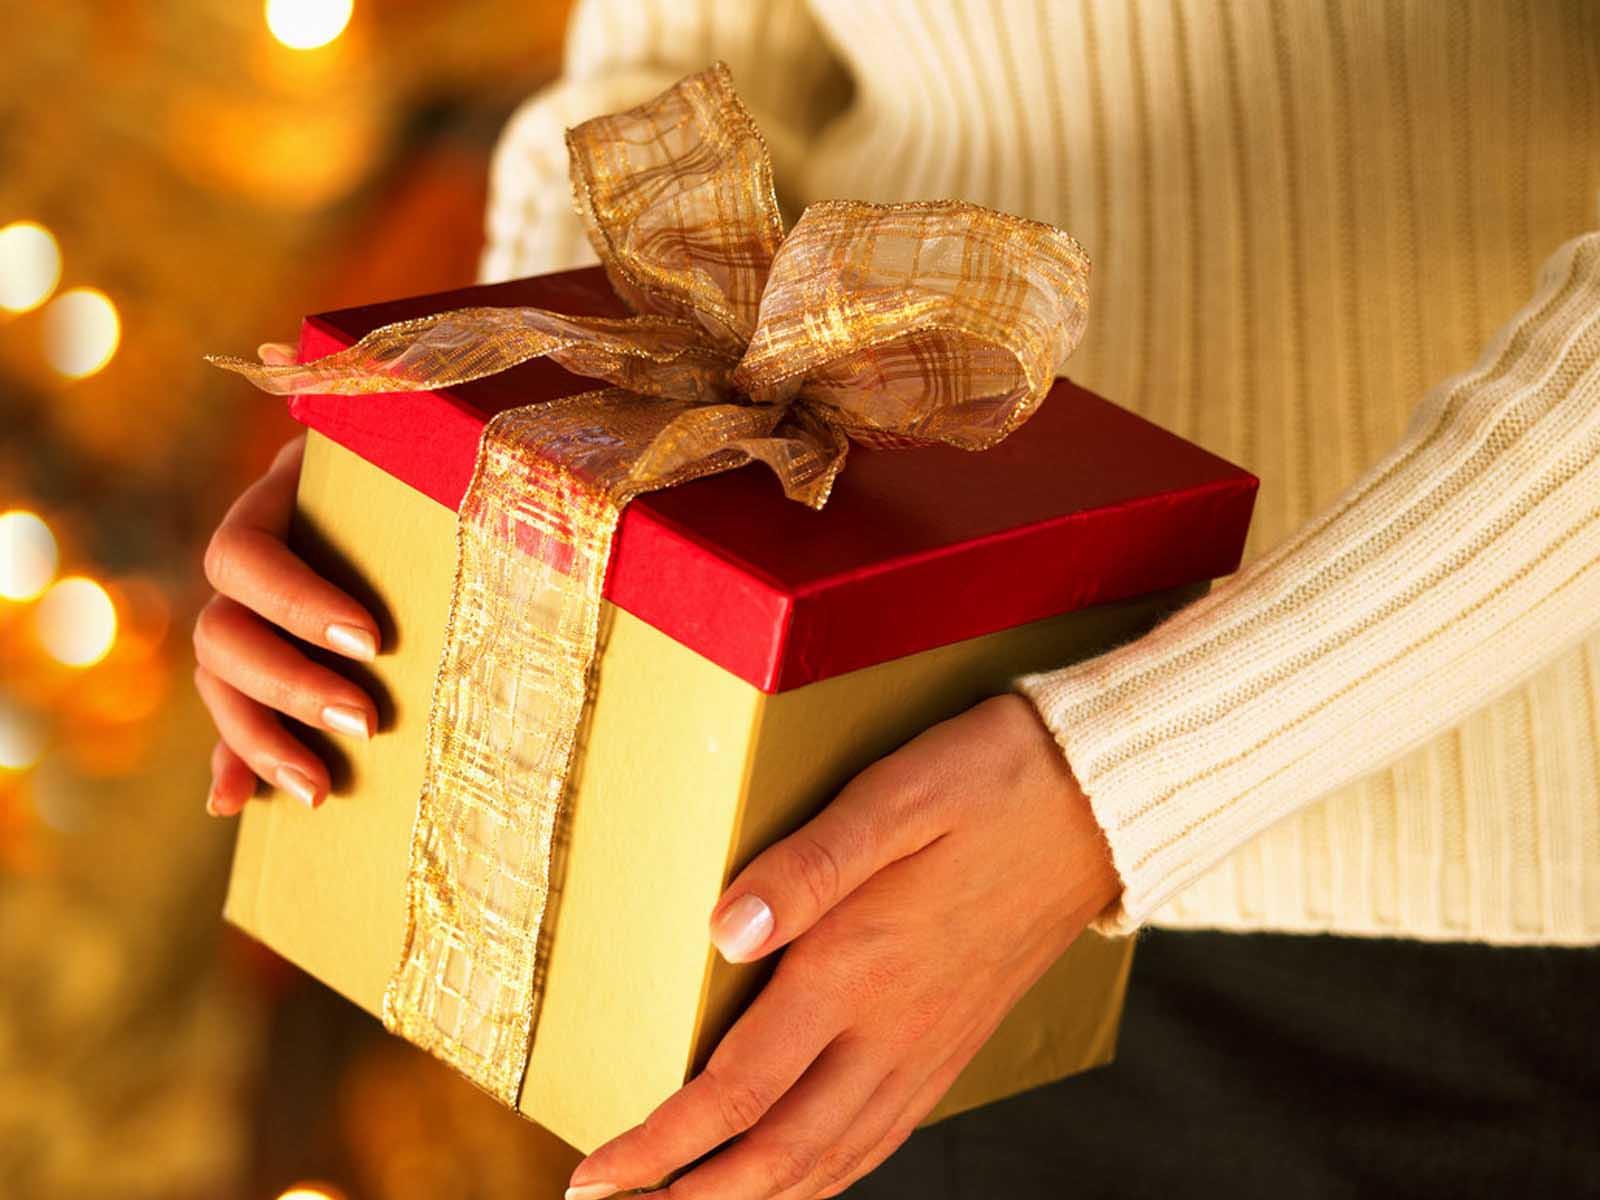 Regali Di Natale Amici.Regali Di Natale Budget Di 300 Euro Tagli Ai Regali Di